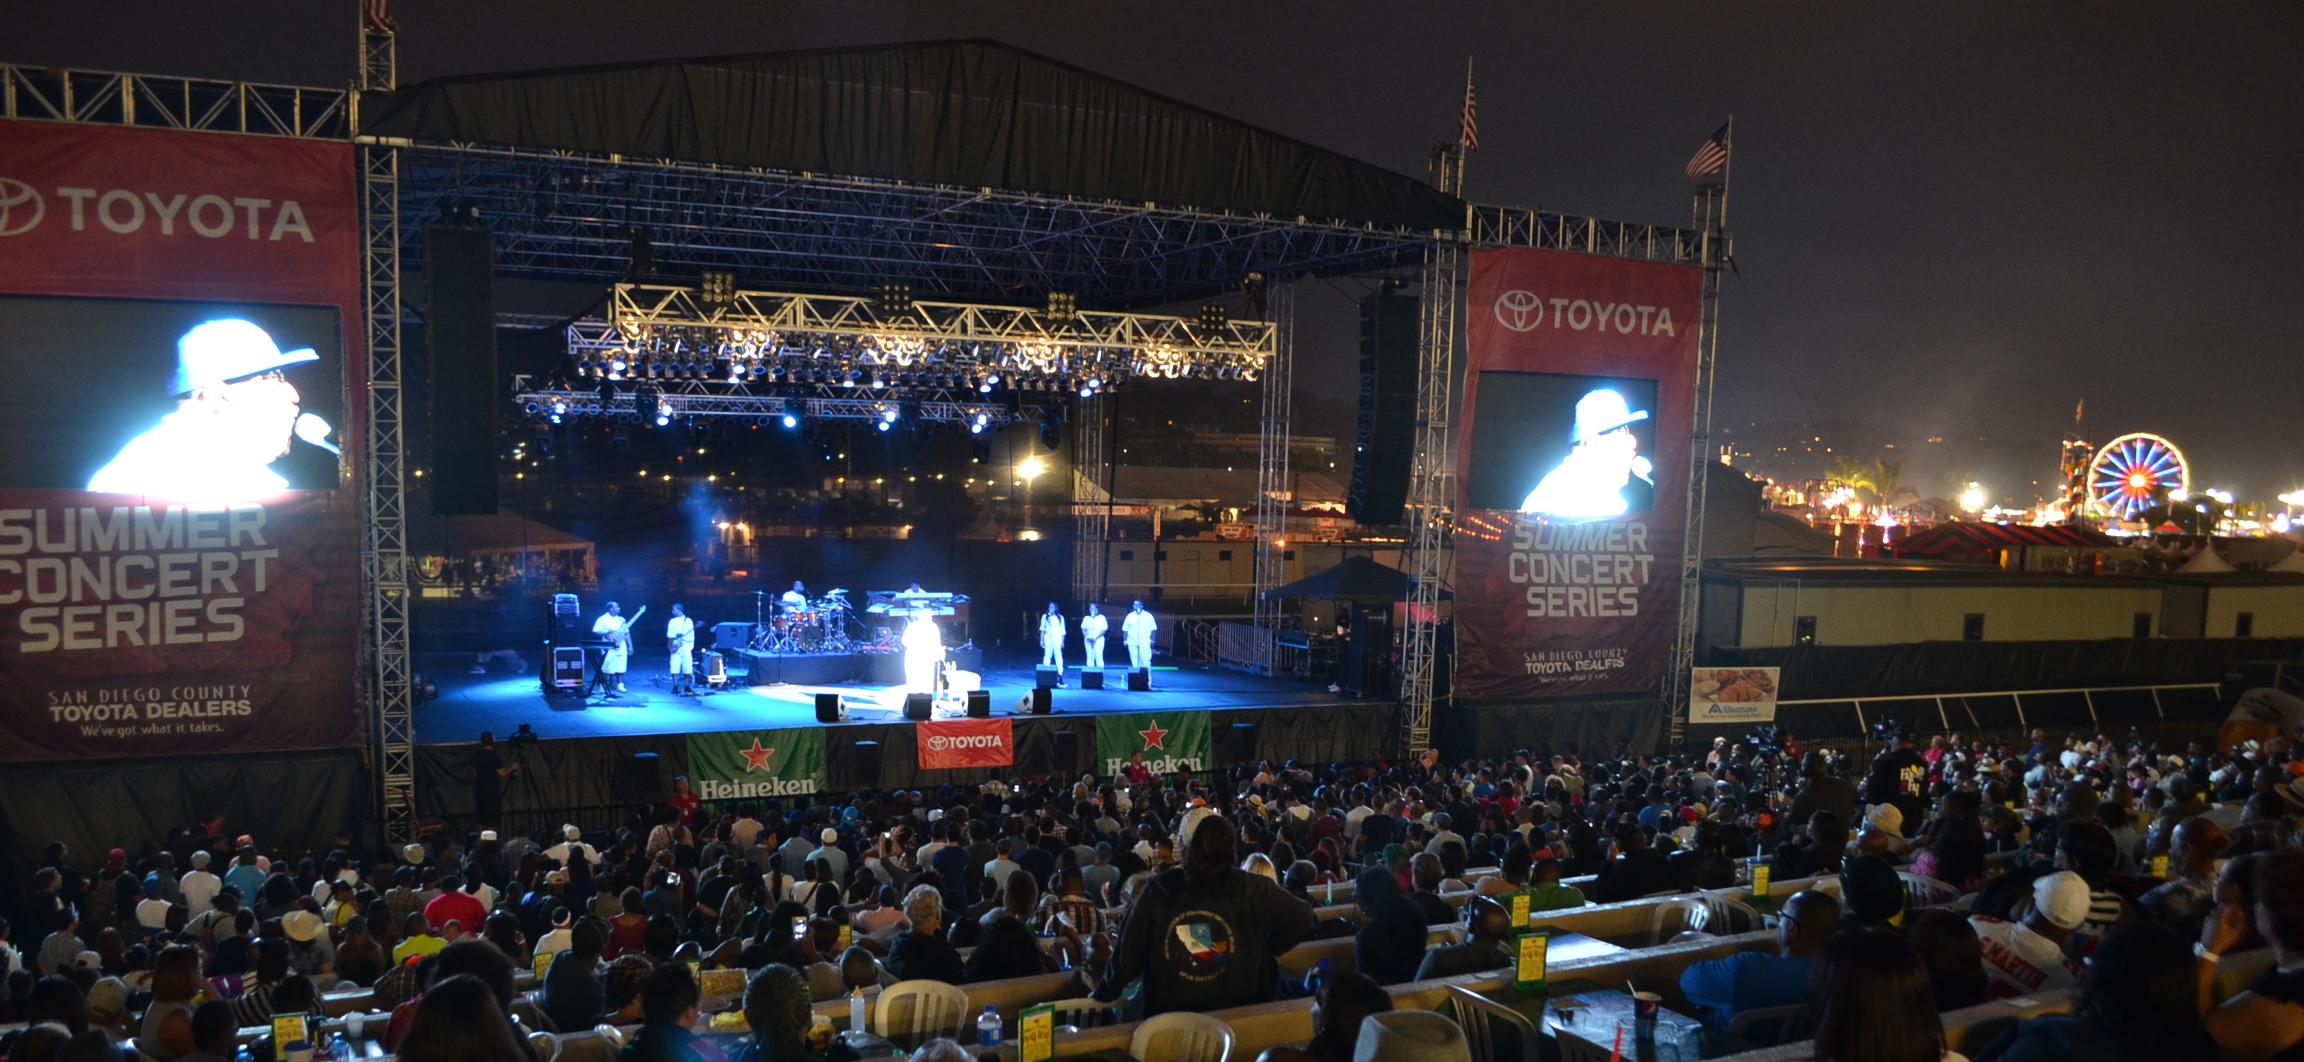 usd concert